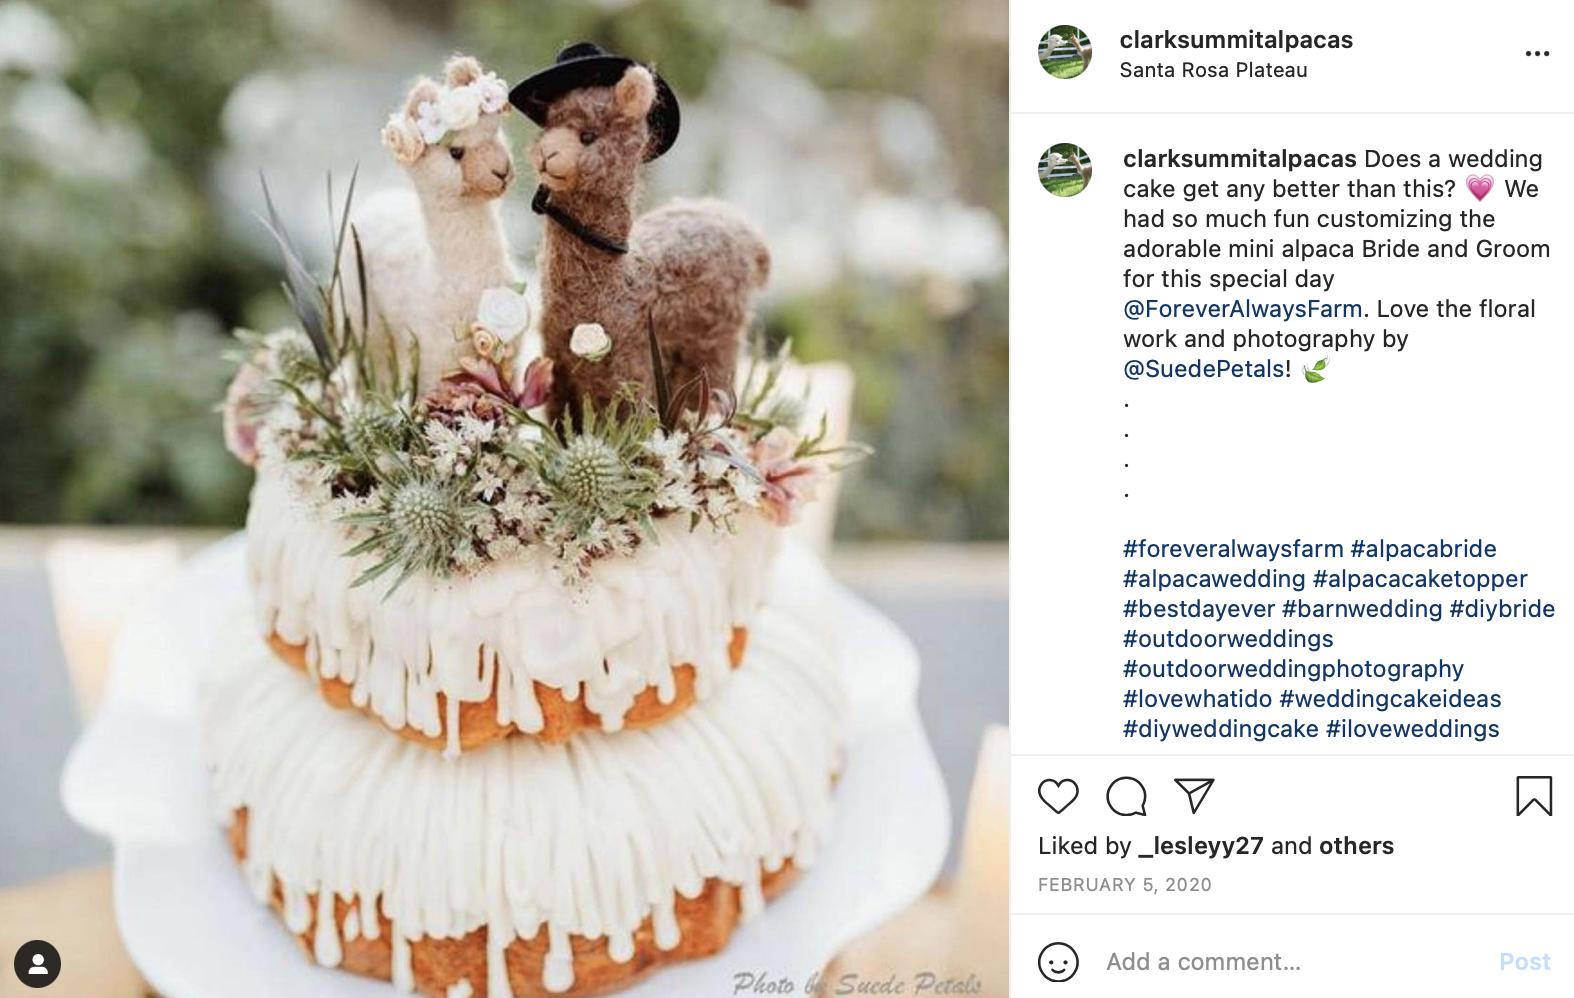 DIY wedding cake with alpacas